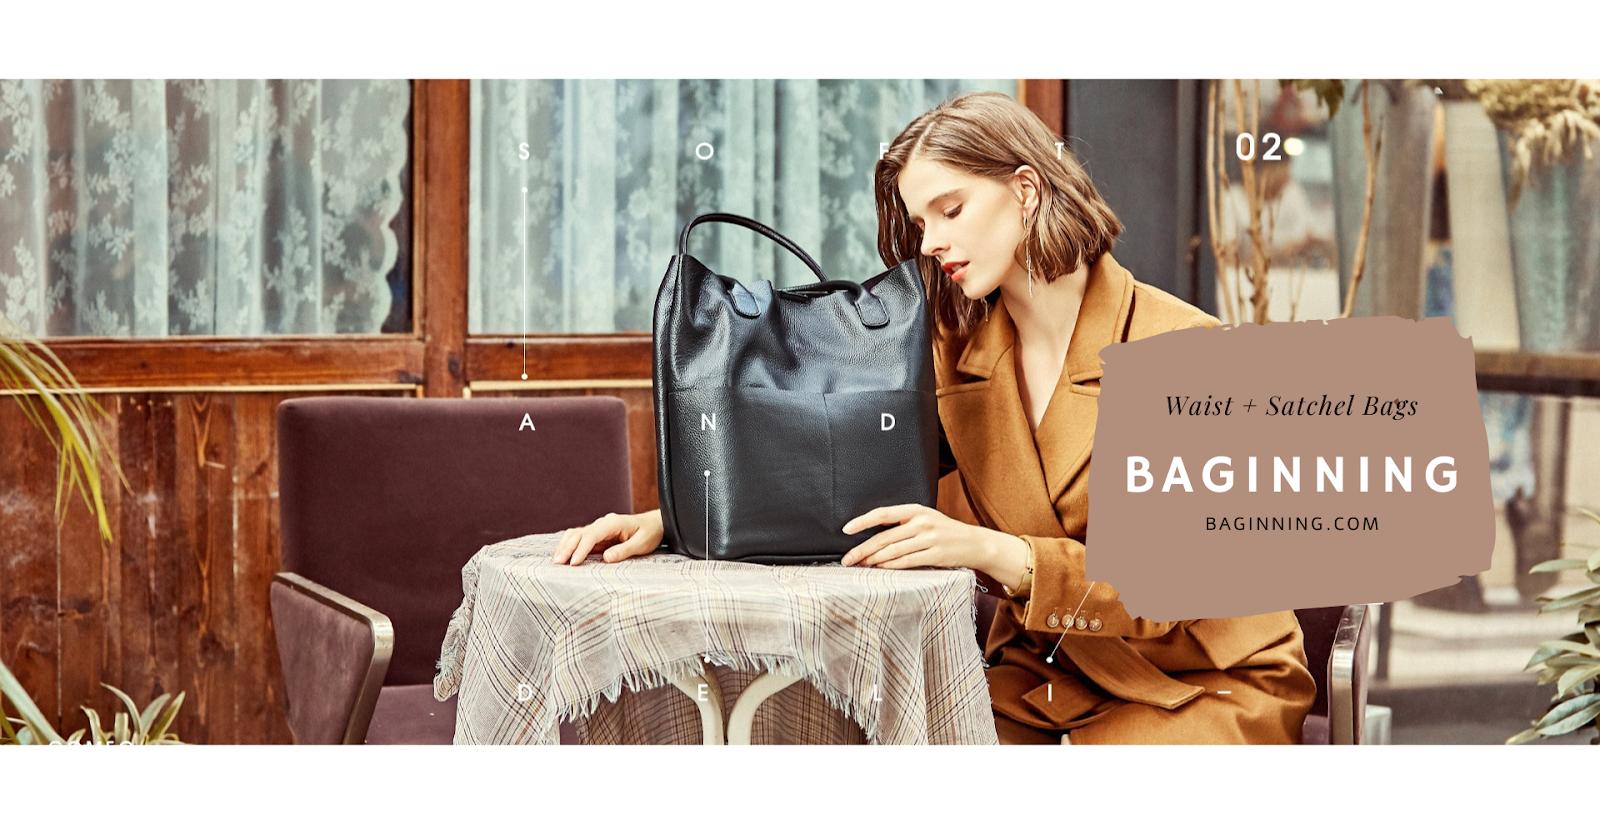 Baginning | Waist + Satchel Bags